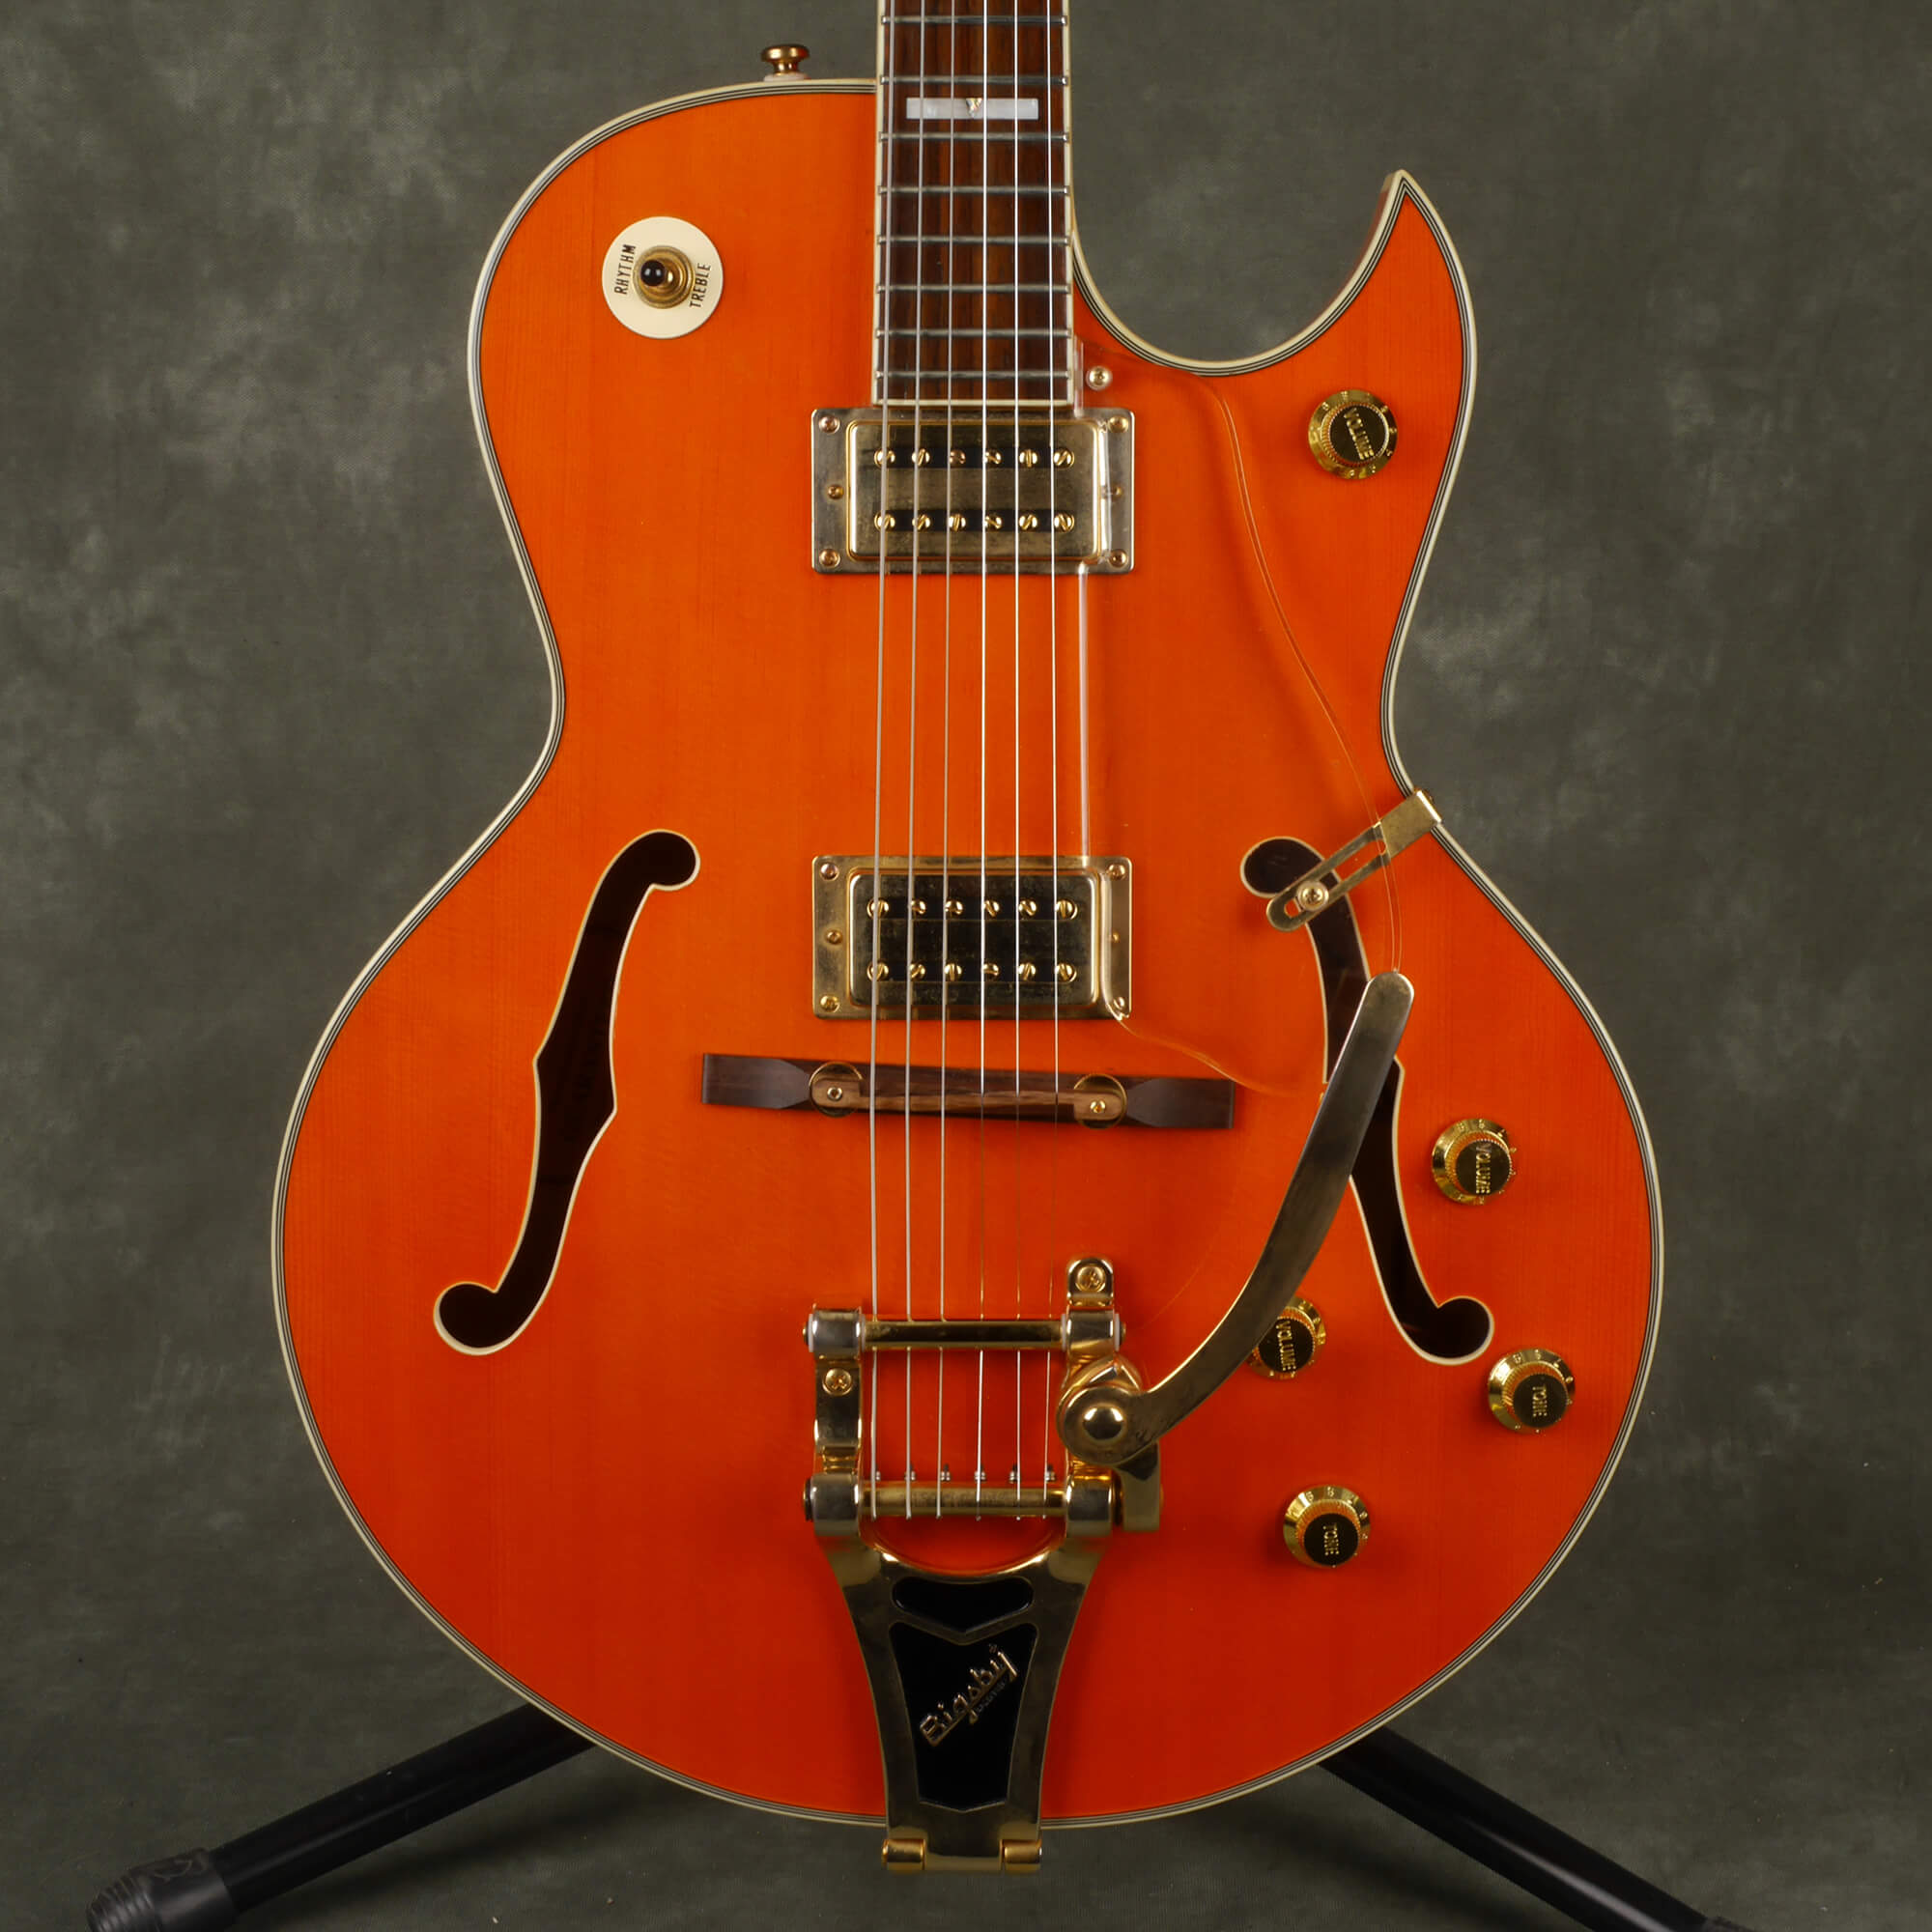 Shine Semi Acoustic Guitar - Orange - 2nd Hand